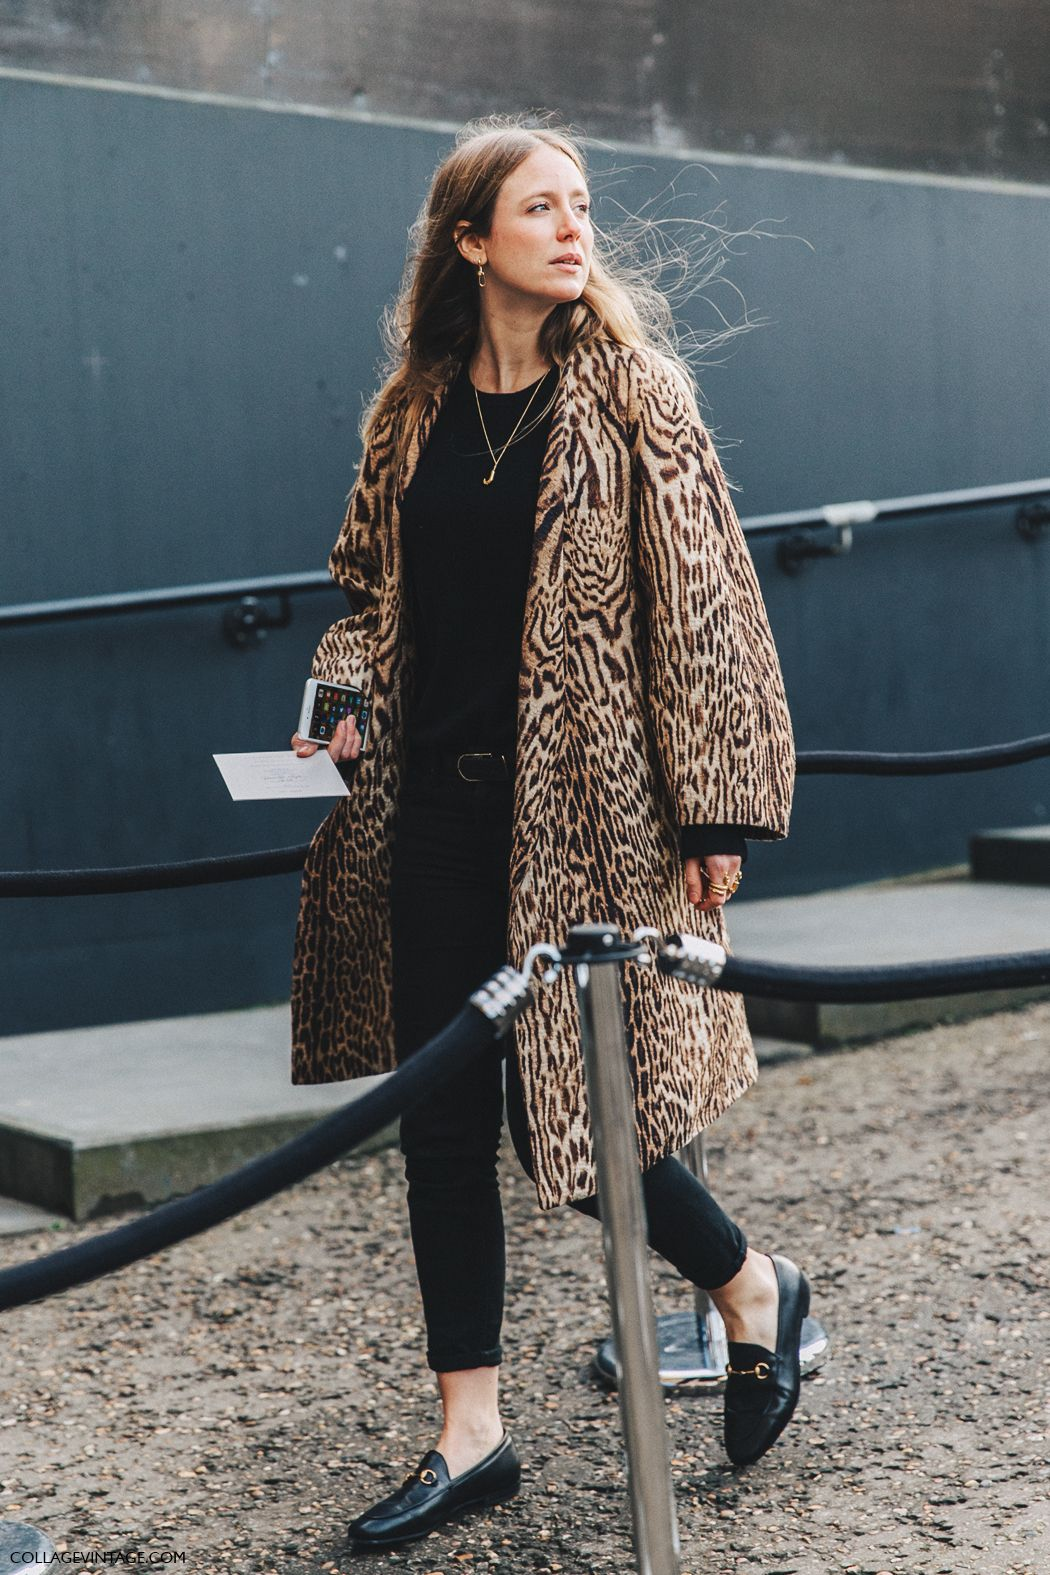 #StreetStyle #Black #Leopard